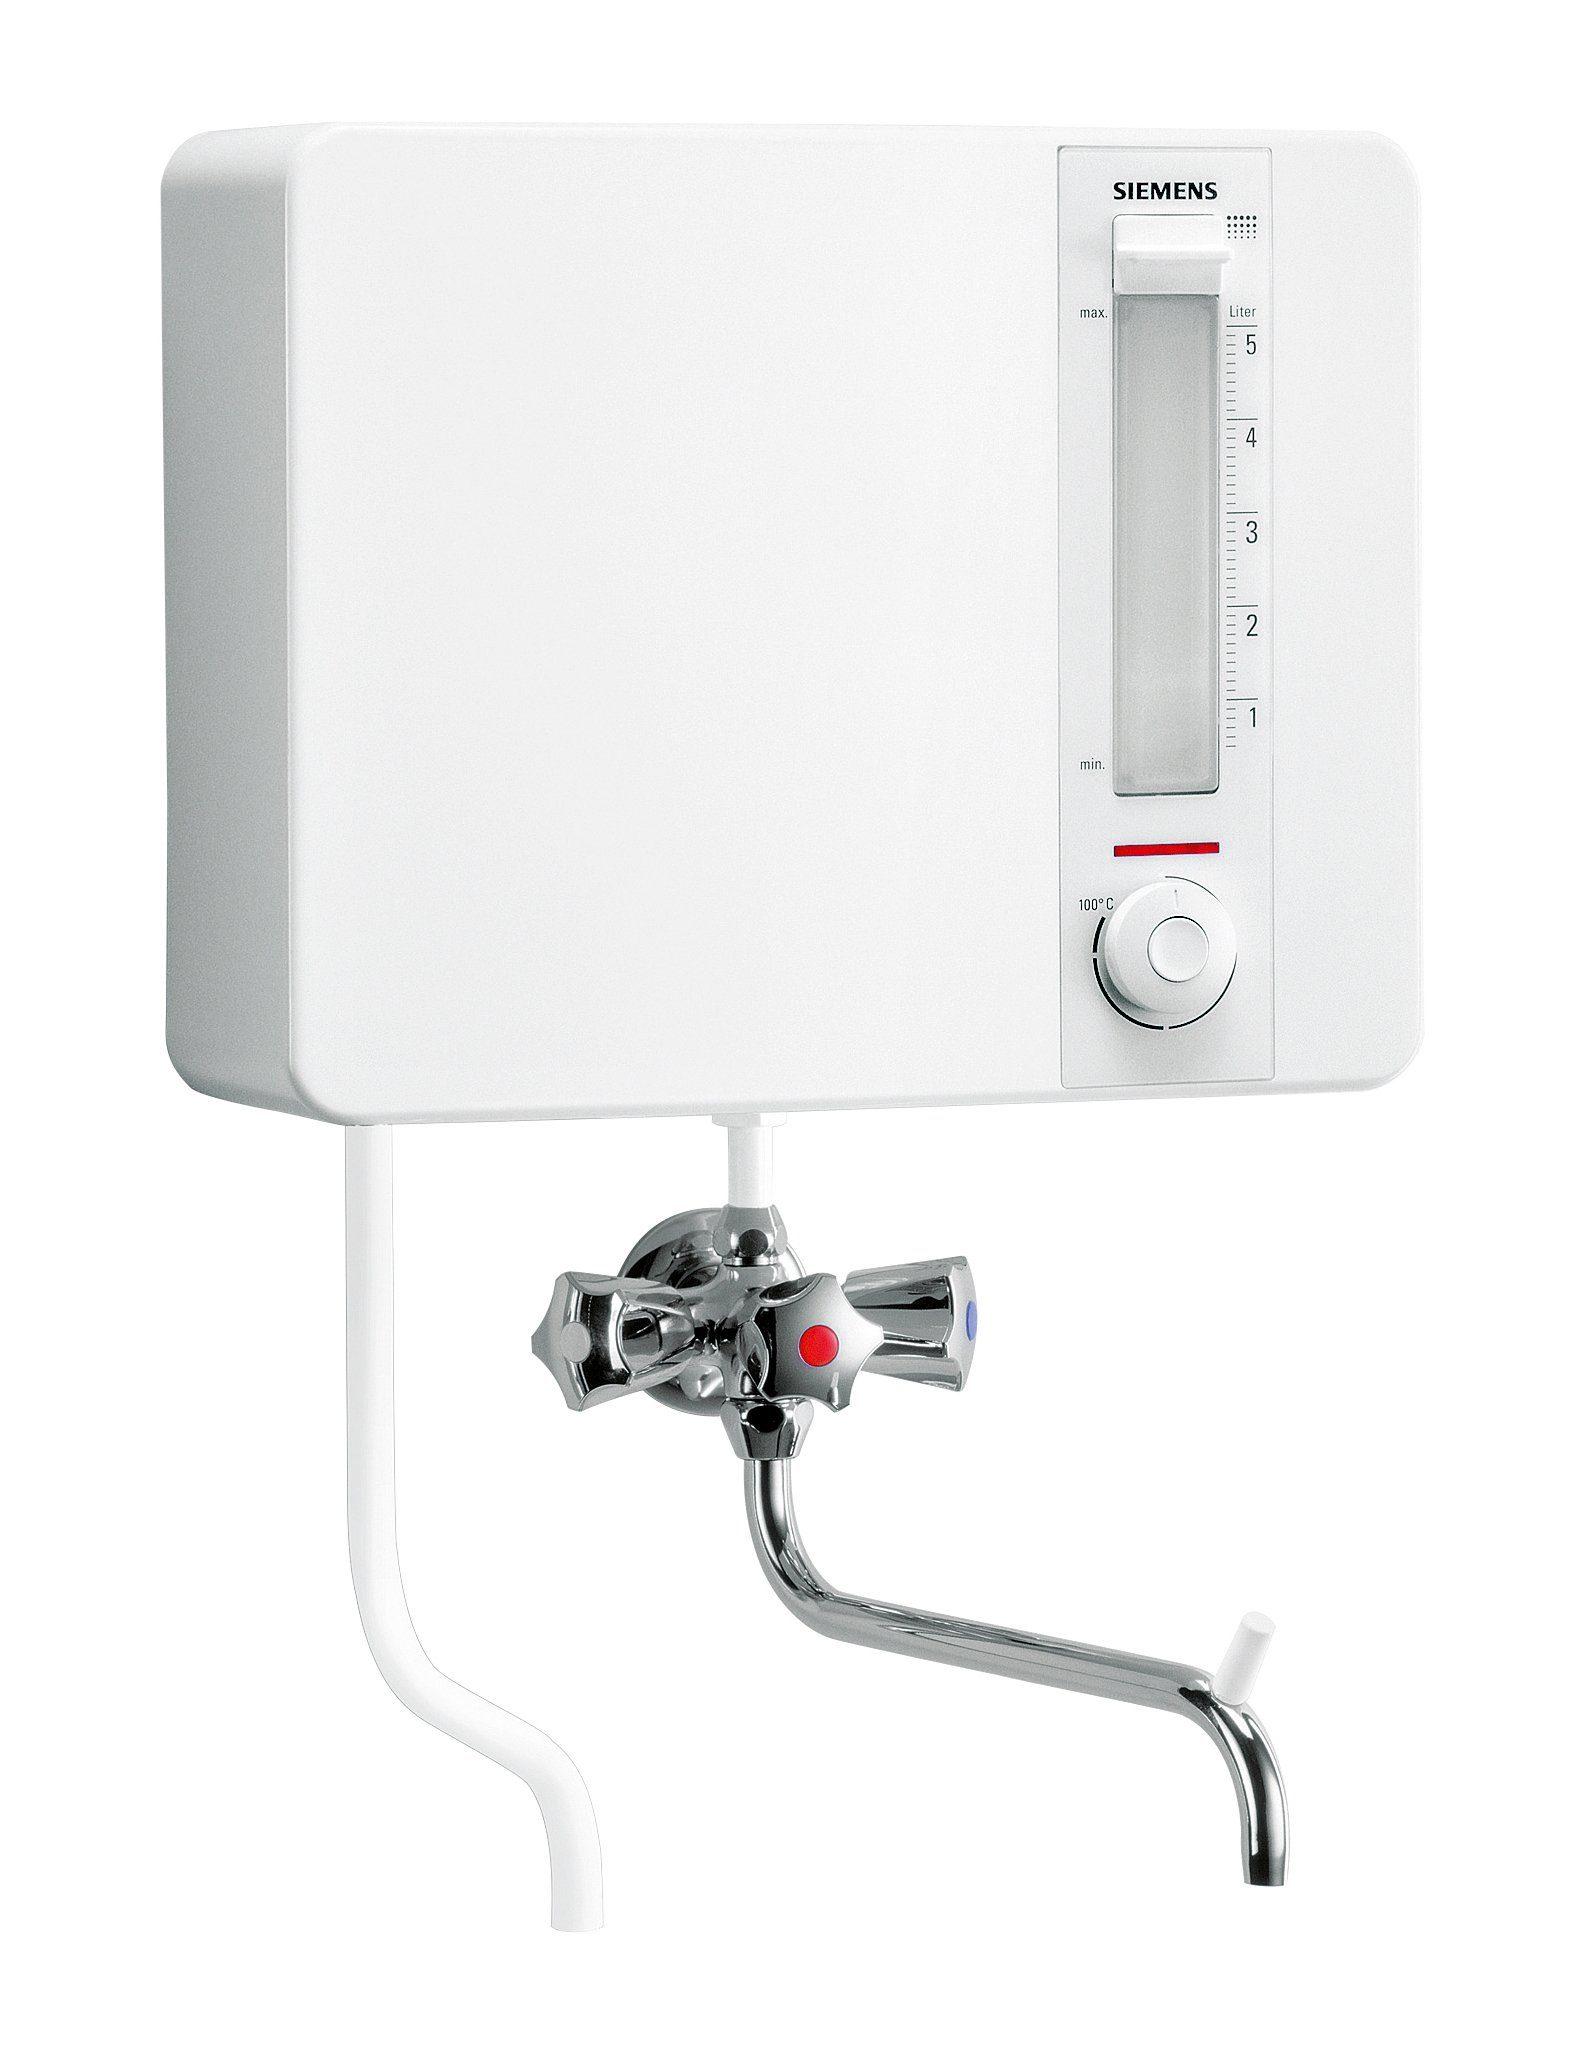 Kochendwasser-Gerät »Siemens BK 20100 inkl. Armatur«